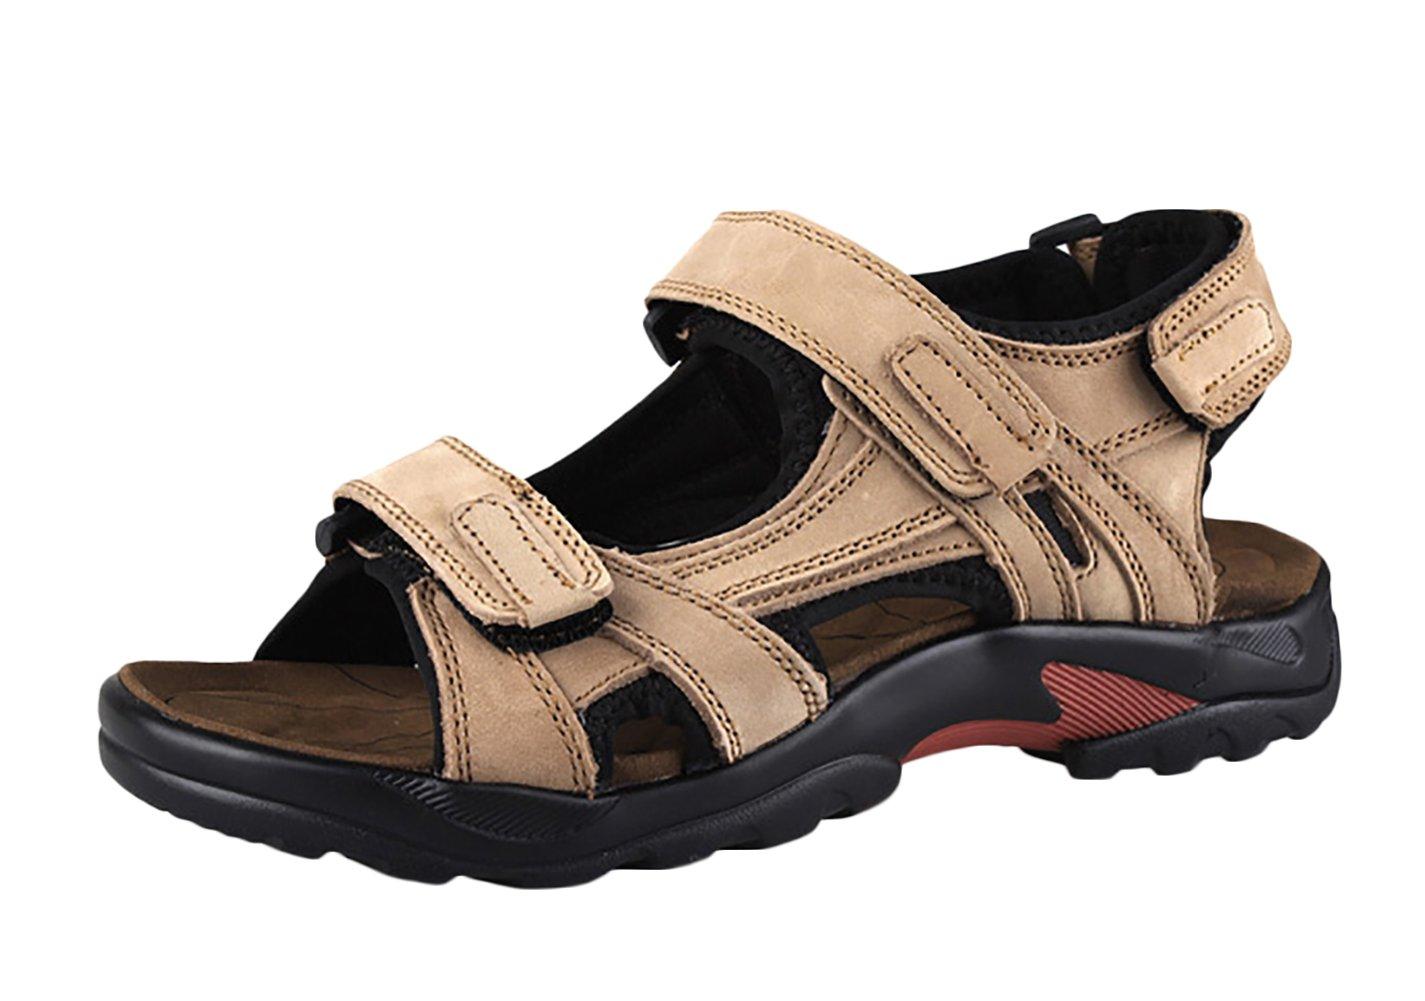 SK Studio Hombre Sandalias Senderismo de Cuero Outdoor Transpirables Zapatos Con Velcro 46 EU|Caqui